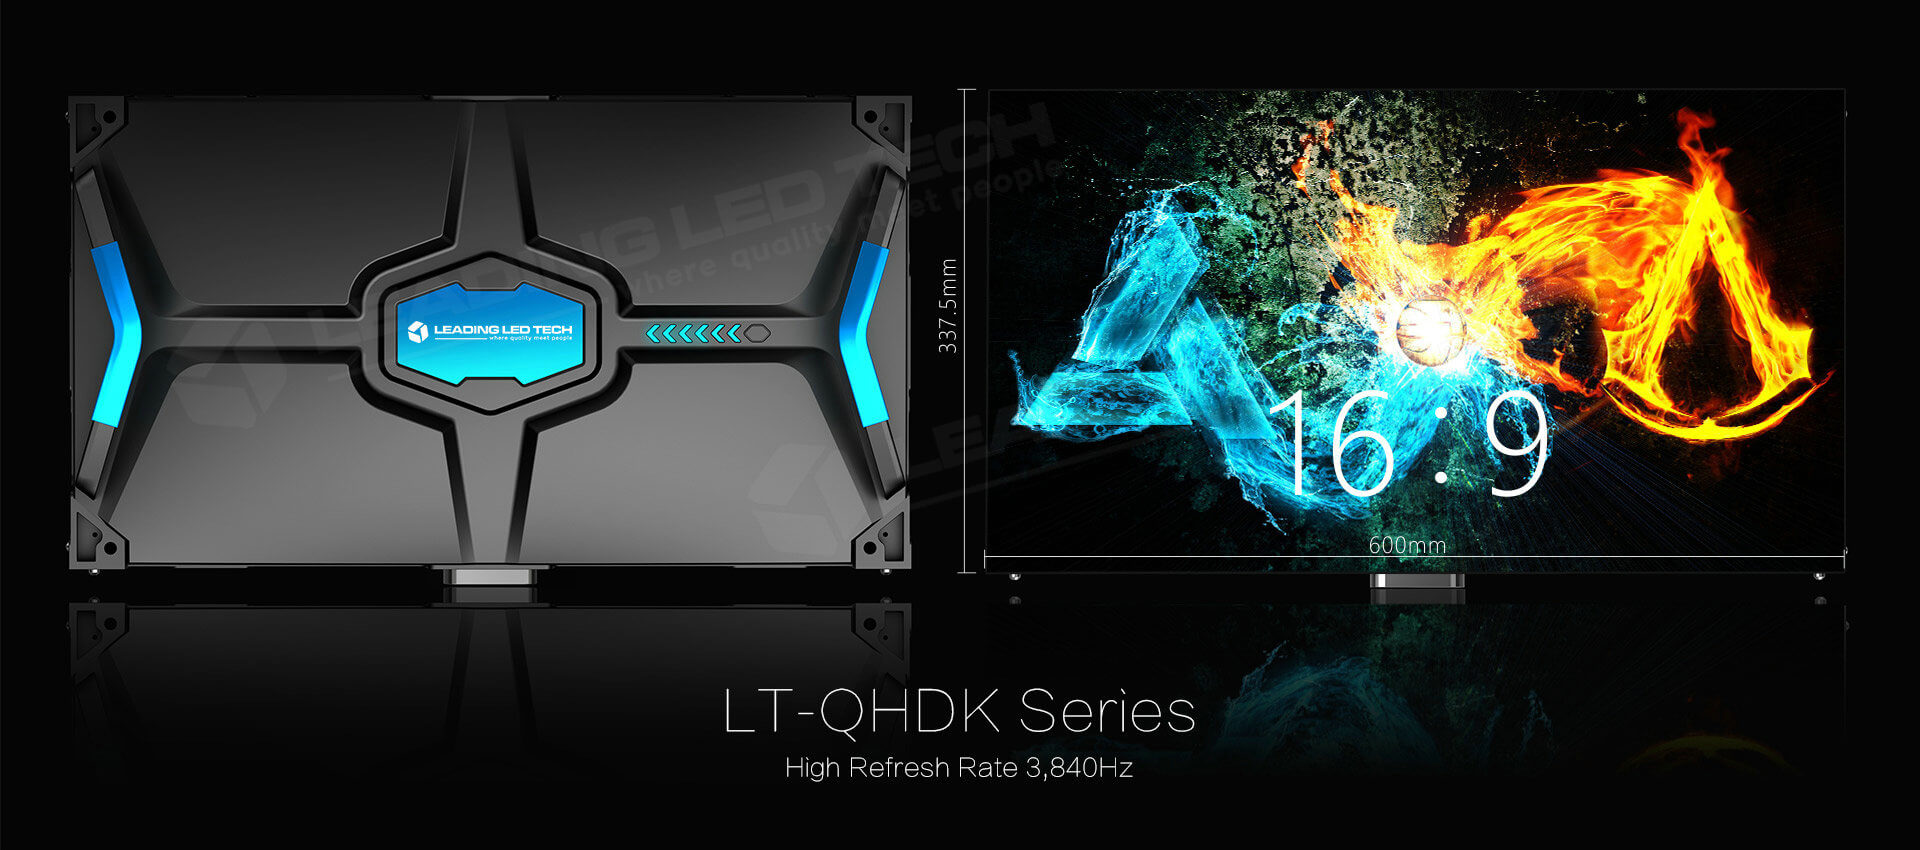 1.2mm 1.5mm1.8mm 2.5mm Pixel Pitch 16:9 HD LED cabinet| LT-QHDK Series| LEADING LED TECH small pixel pitch 16-9 panel